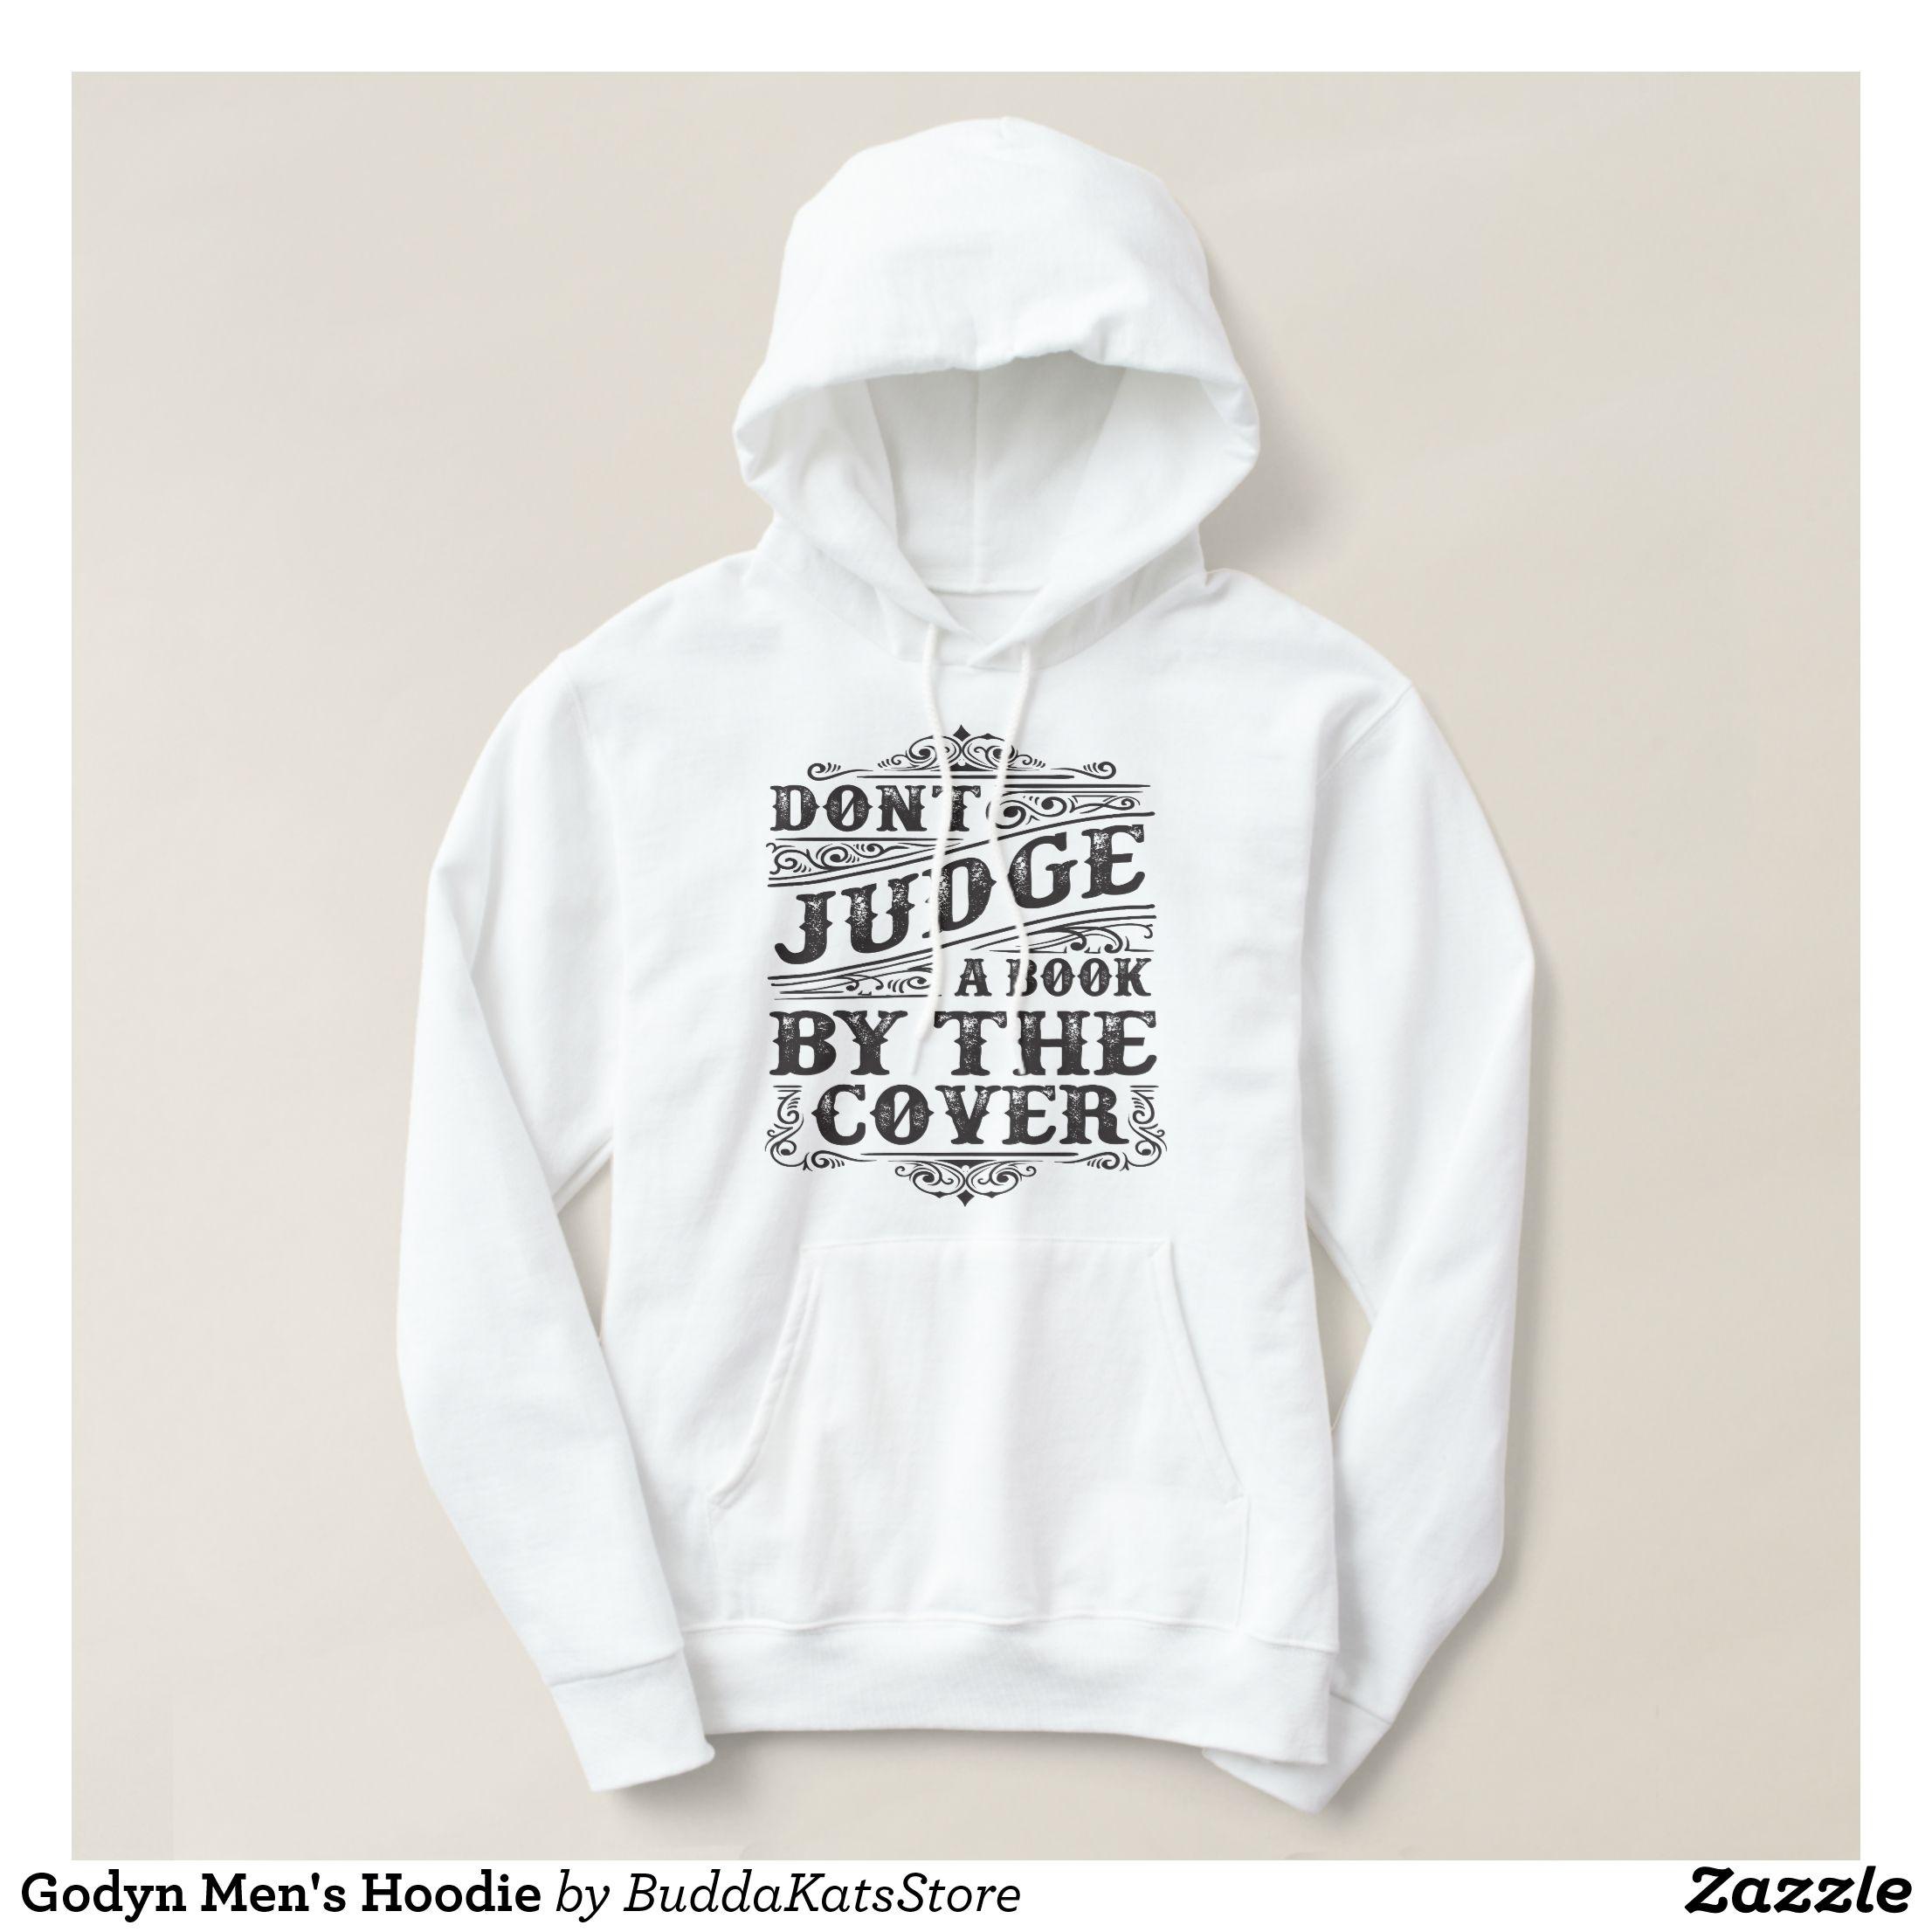 I Love Book-Personalized Gift Cute Sweatshirt